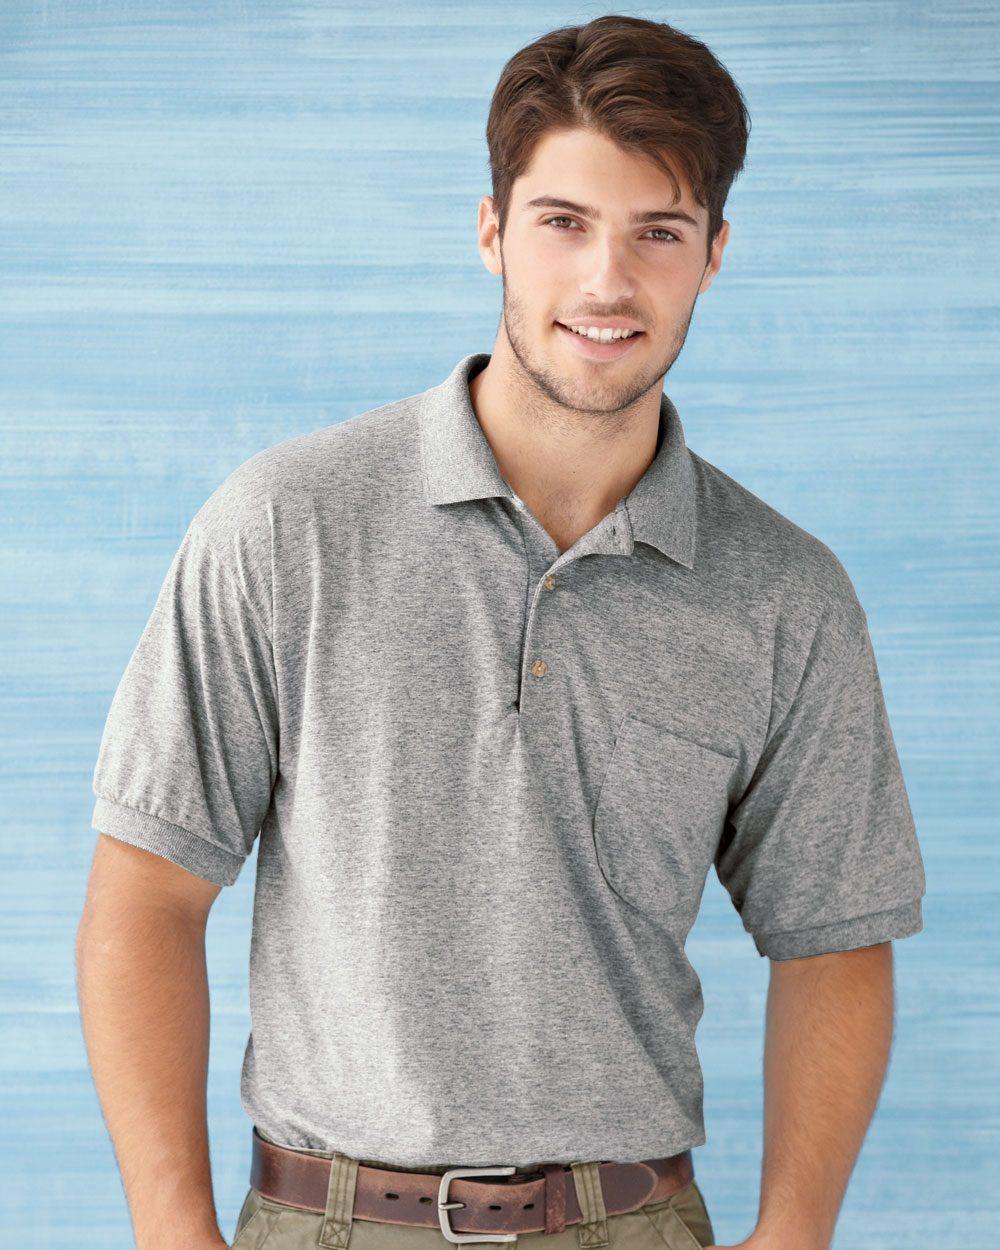 6ad1482d Gildan DryBlend™ 6 oz., 50/50 Jersey Polo with Pocket G890 - Evan ...